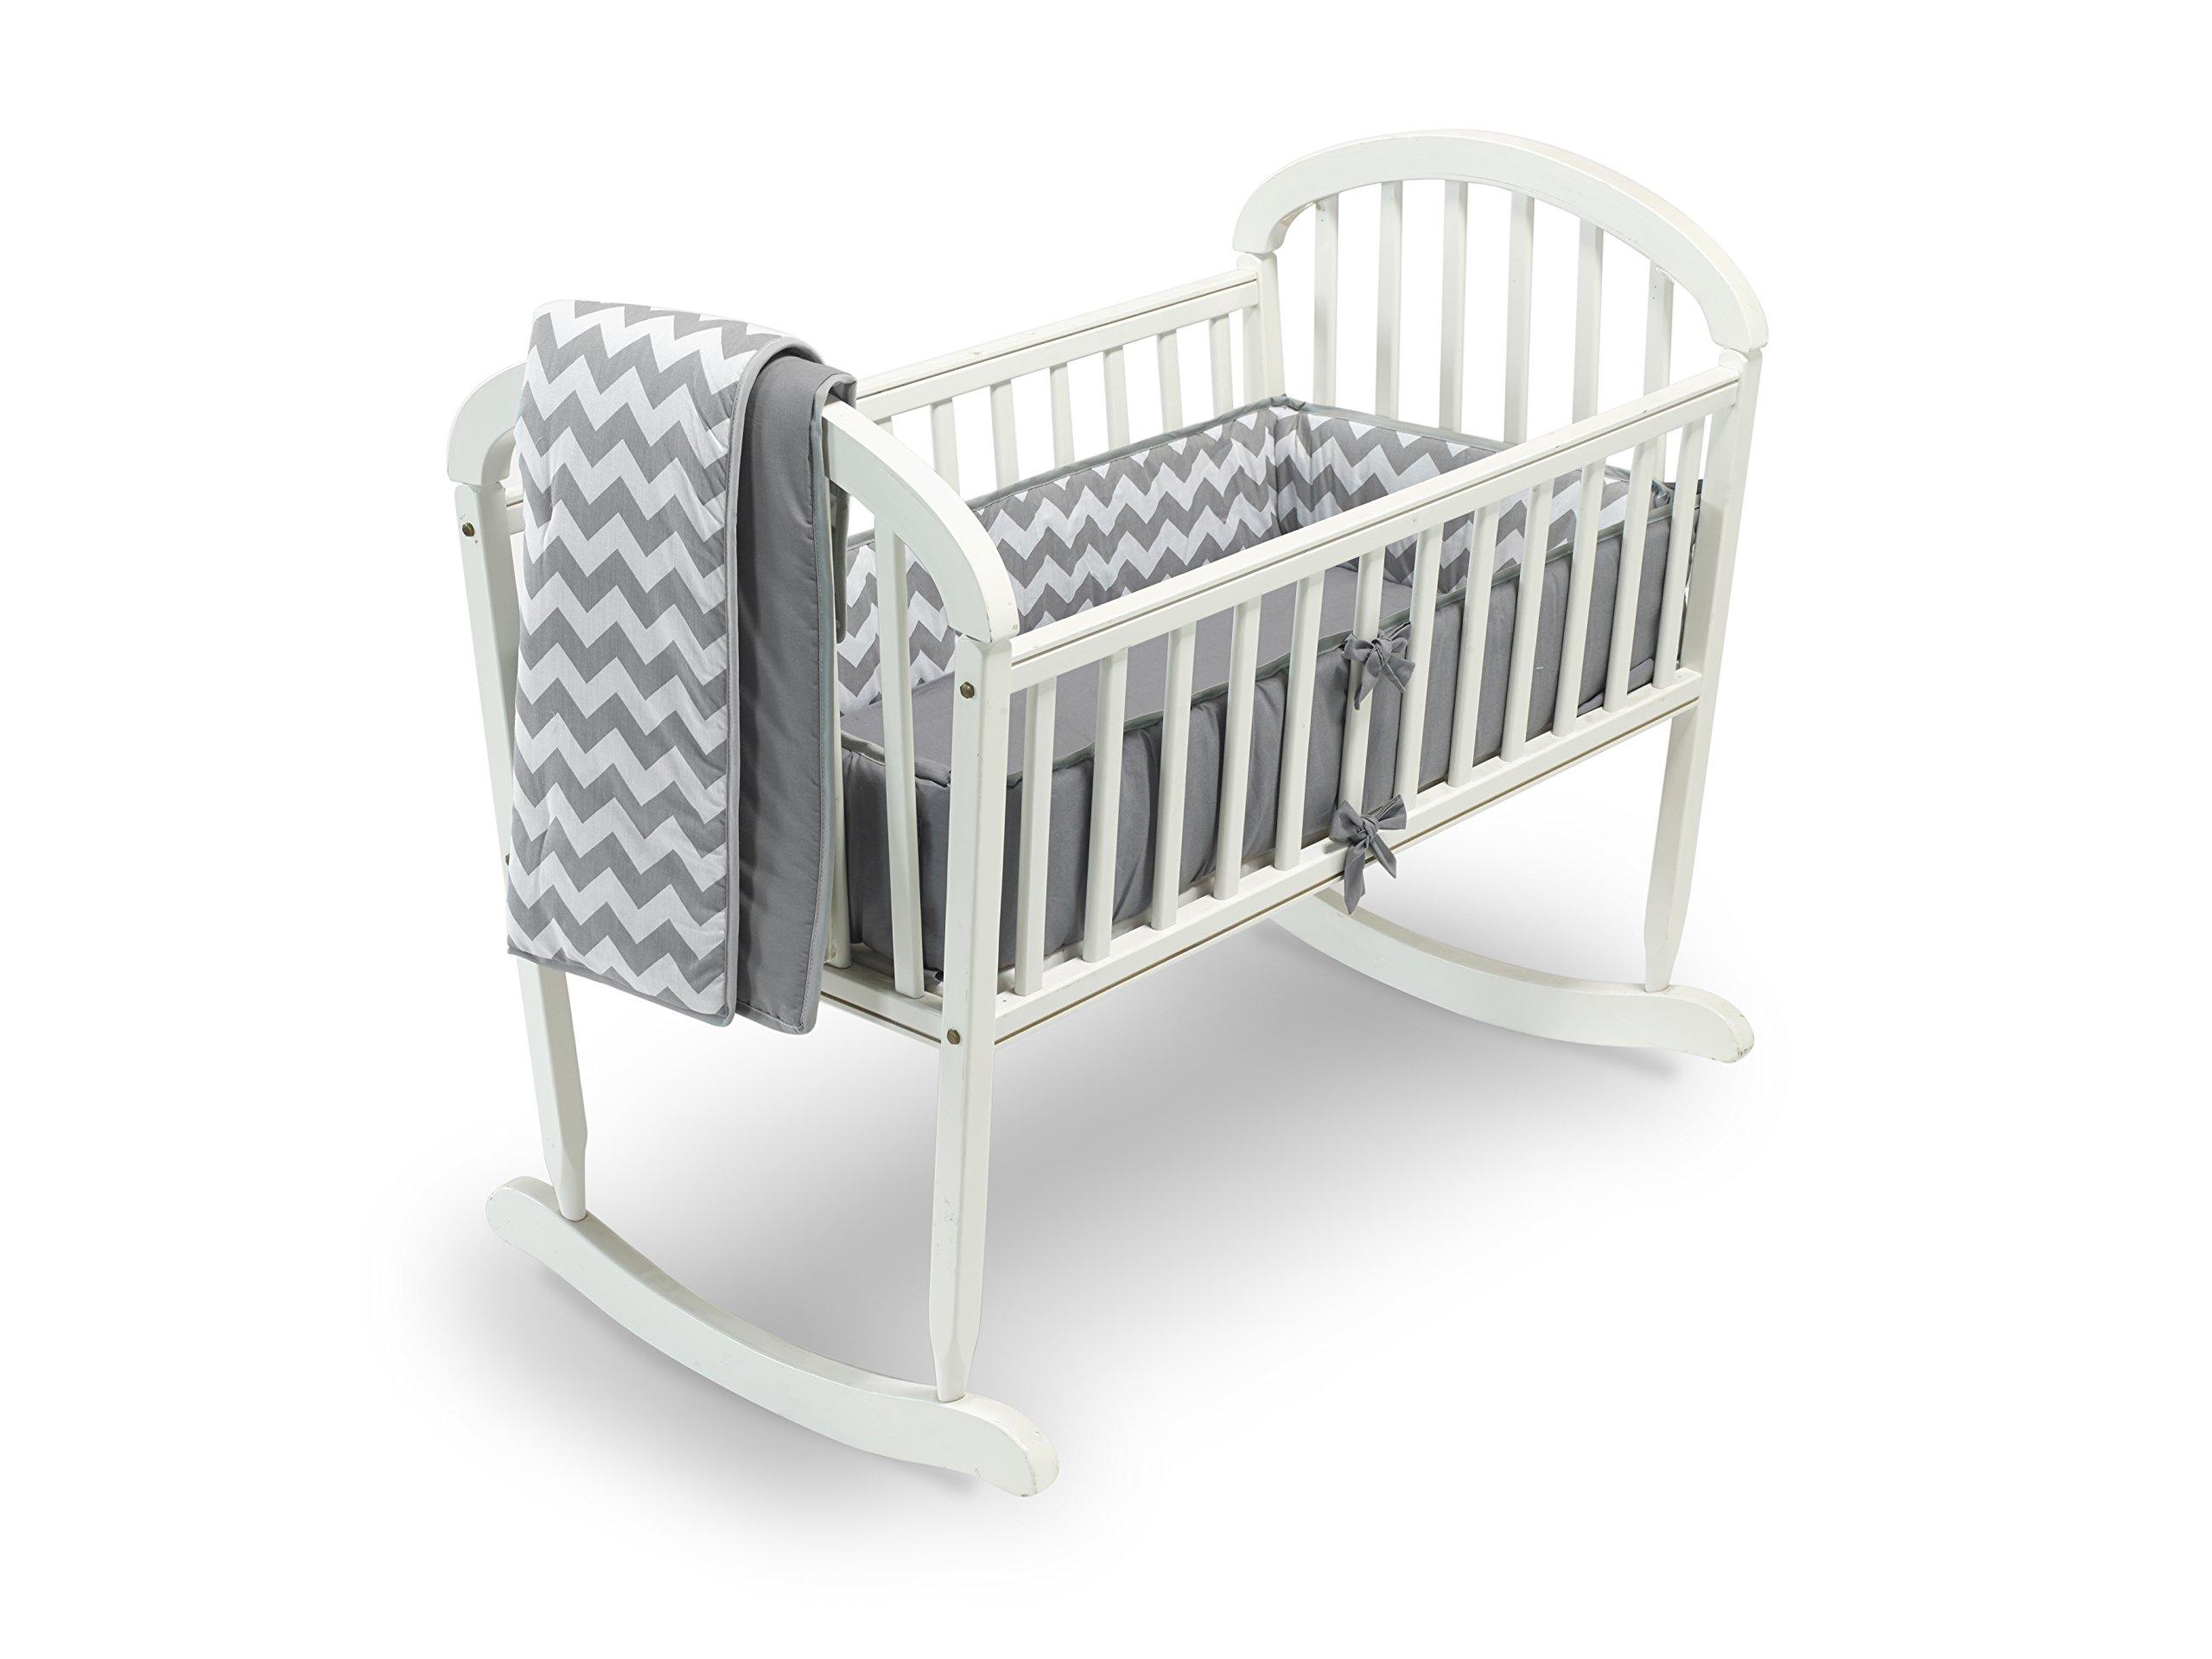 Baby Doll Bedding Chevron Cradle Bedding Set, Grey by BabyDoll Bedding